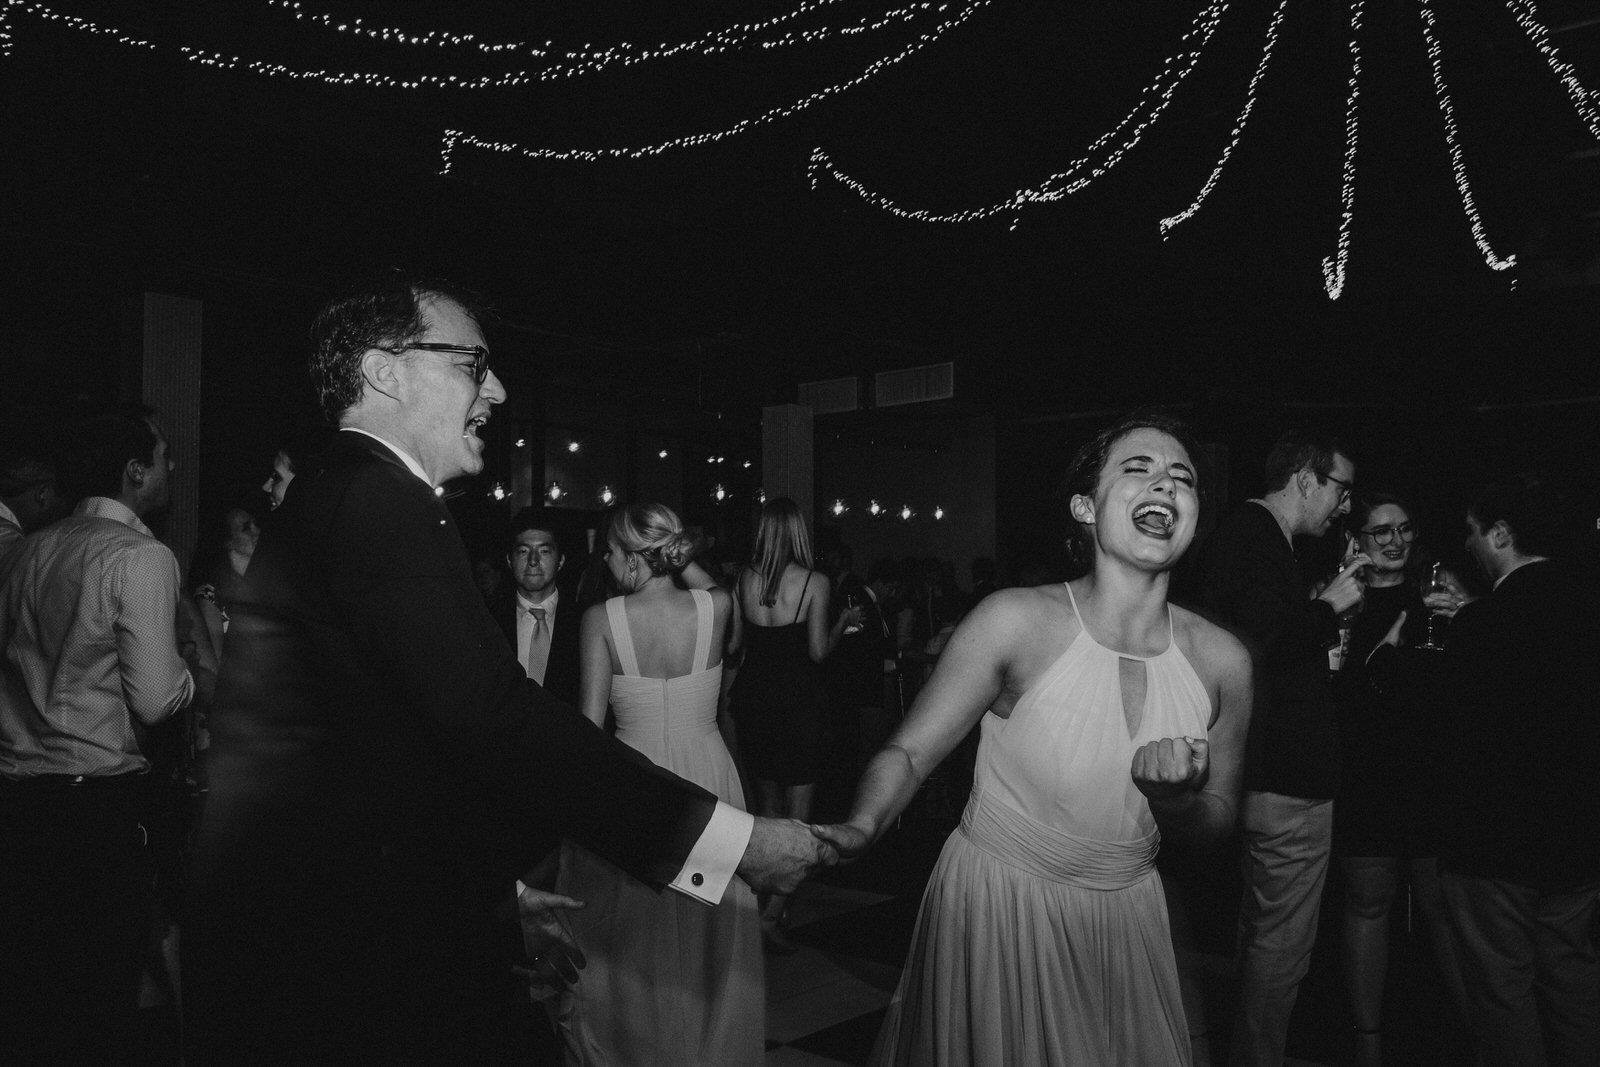 Oxford_Mississippi_wedding_photographer_41.JPG